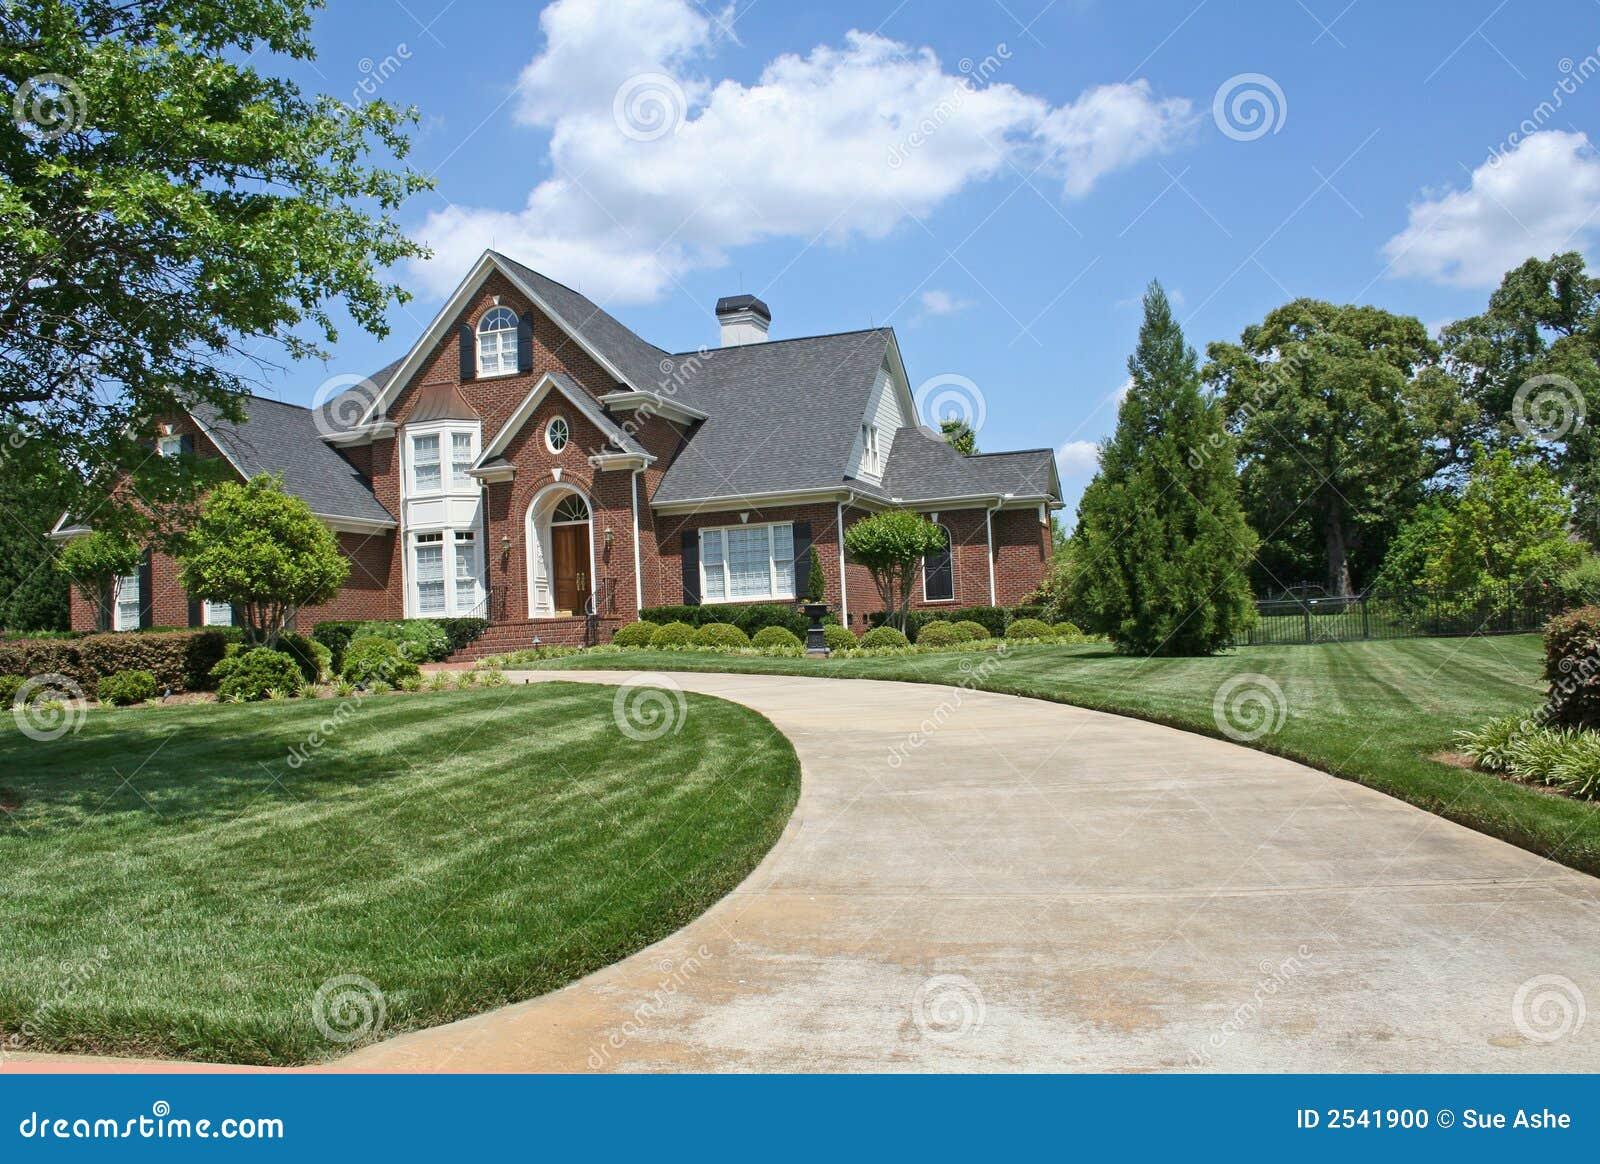 Maison am ricaine de luxe photo stock image 2541900 - Style maison americaine ...